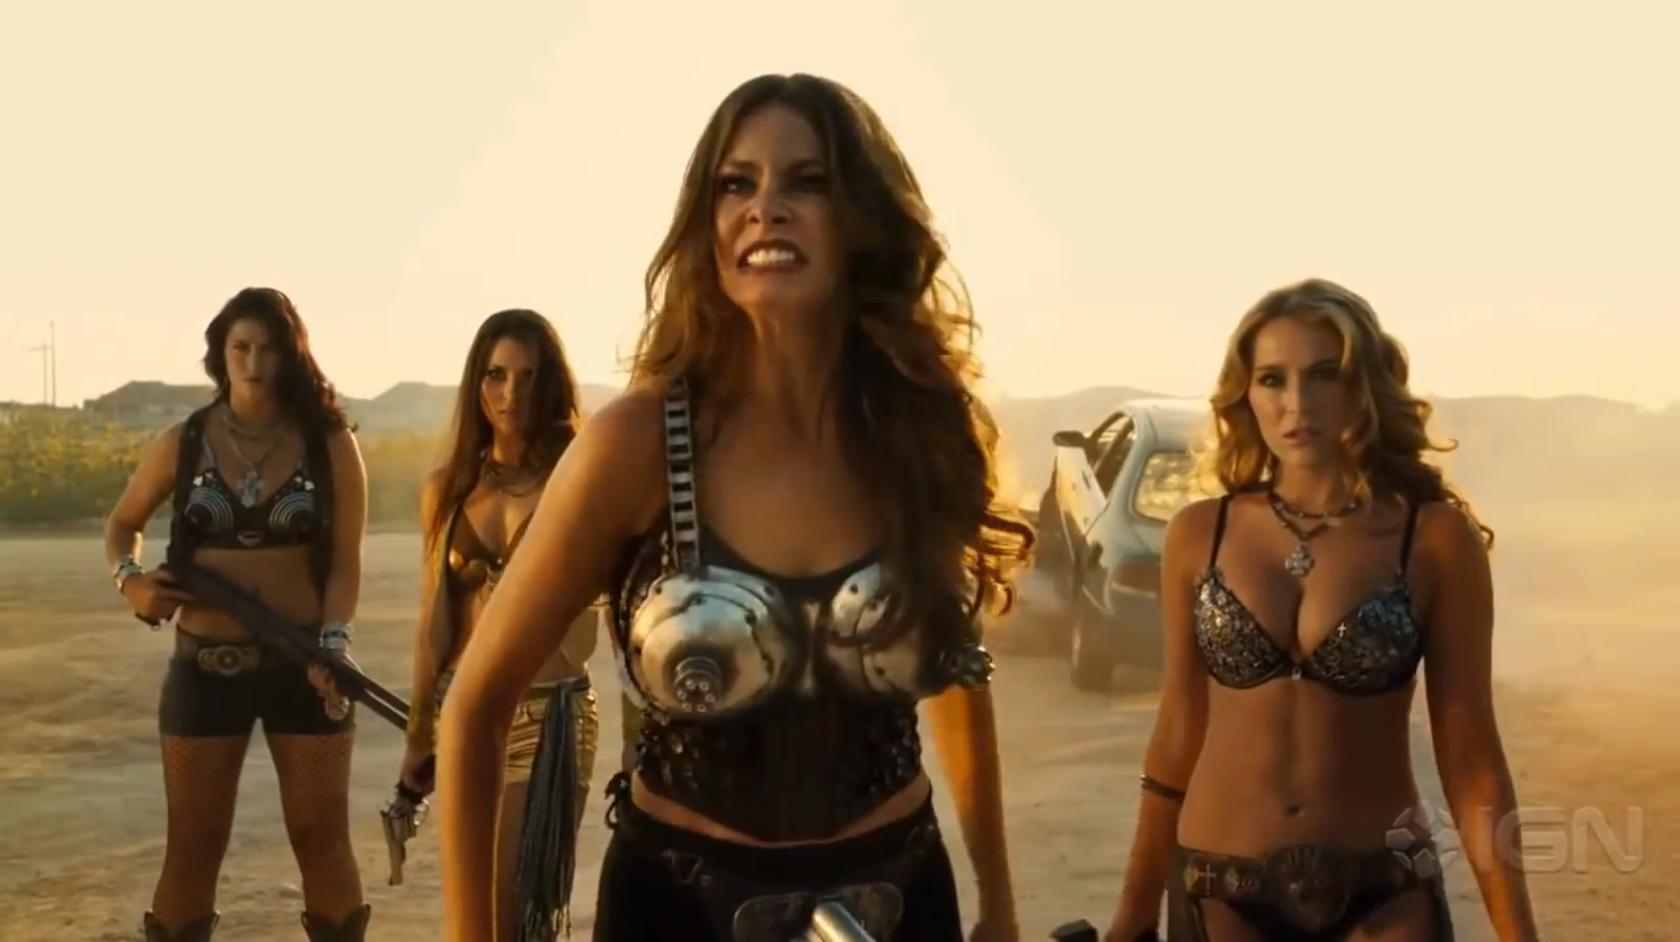 Machete Cast machete k... Amber Heard